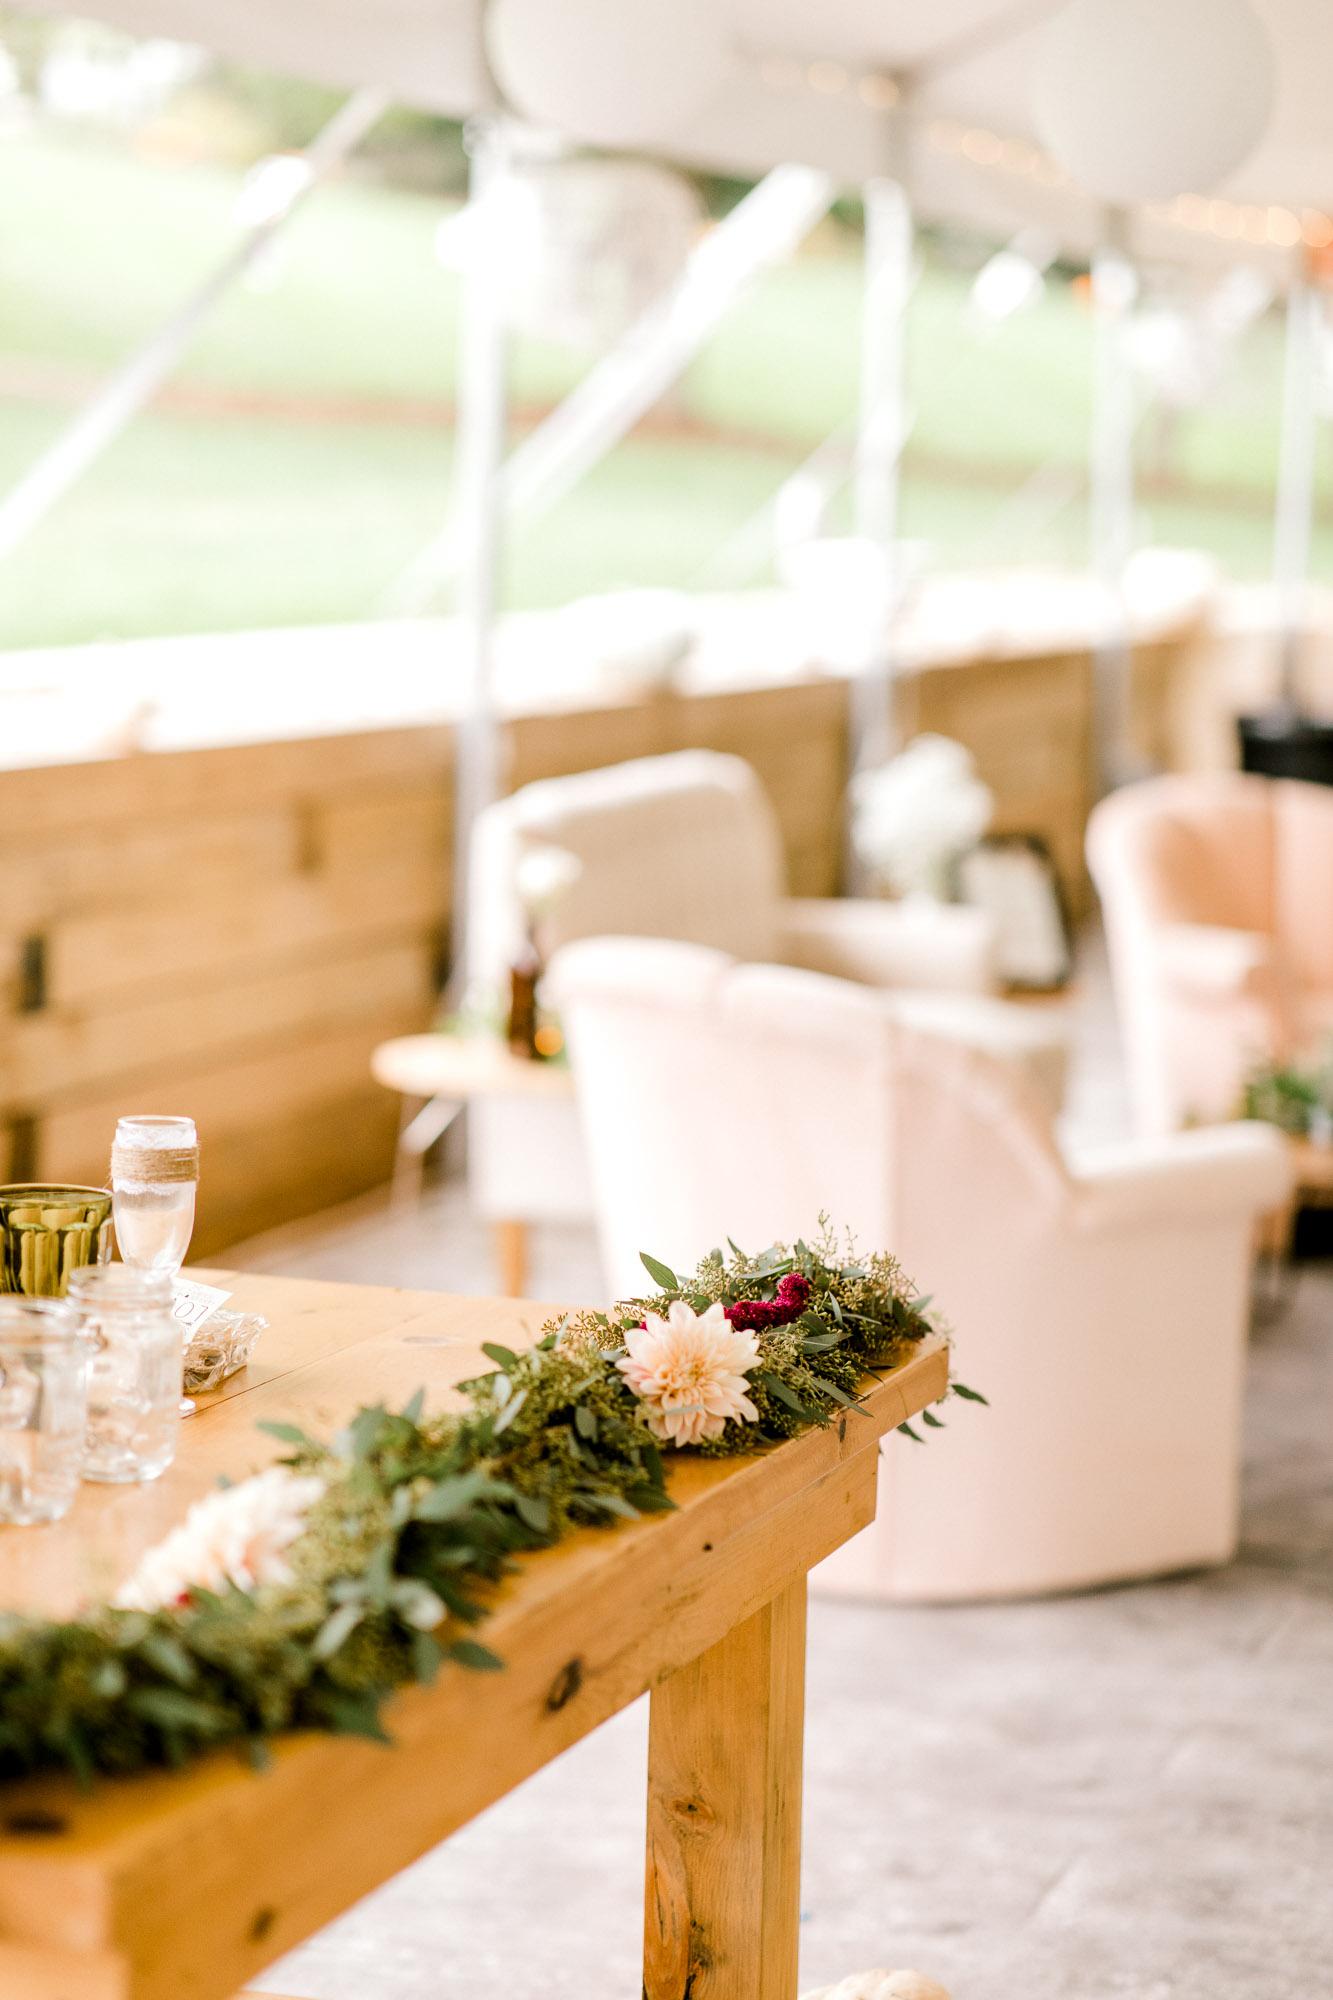 Lodge-at-Raven-Creek-October-wedding-11.jpg